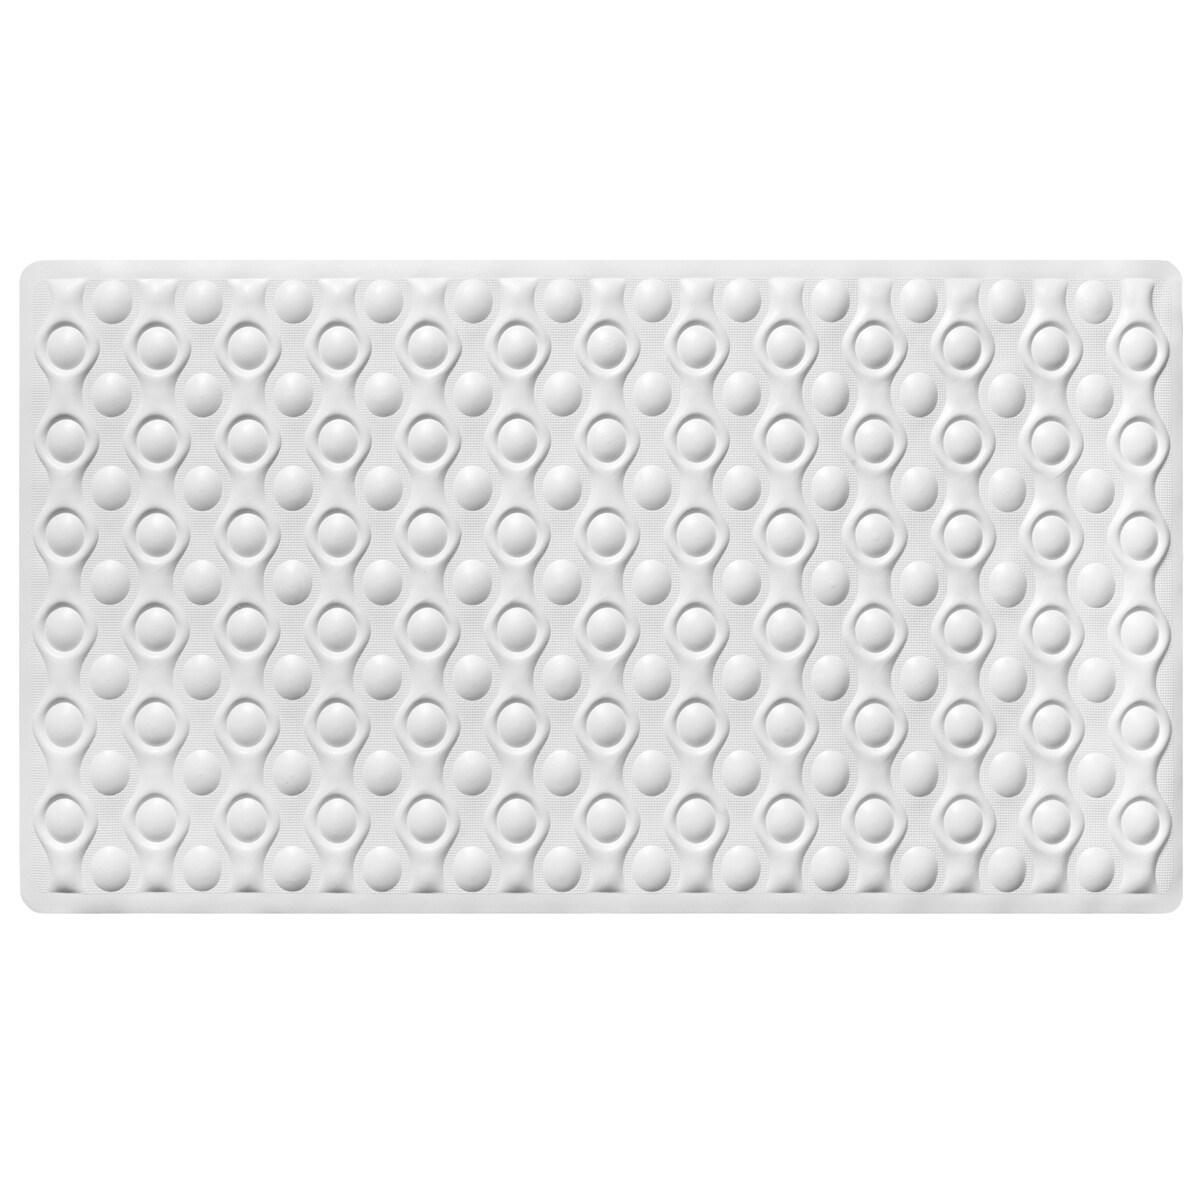 "Non-Slip Natural Rubber Beige or White Tub Mat (16"" x 28""..."